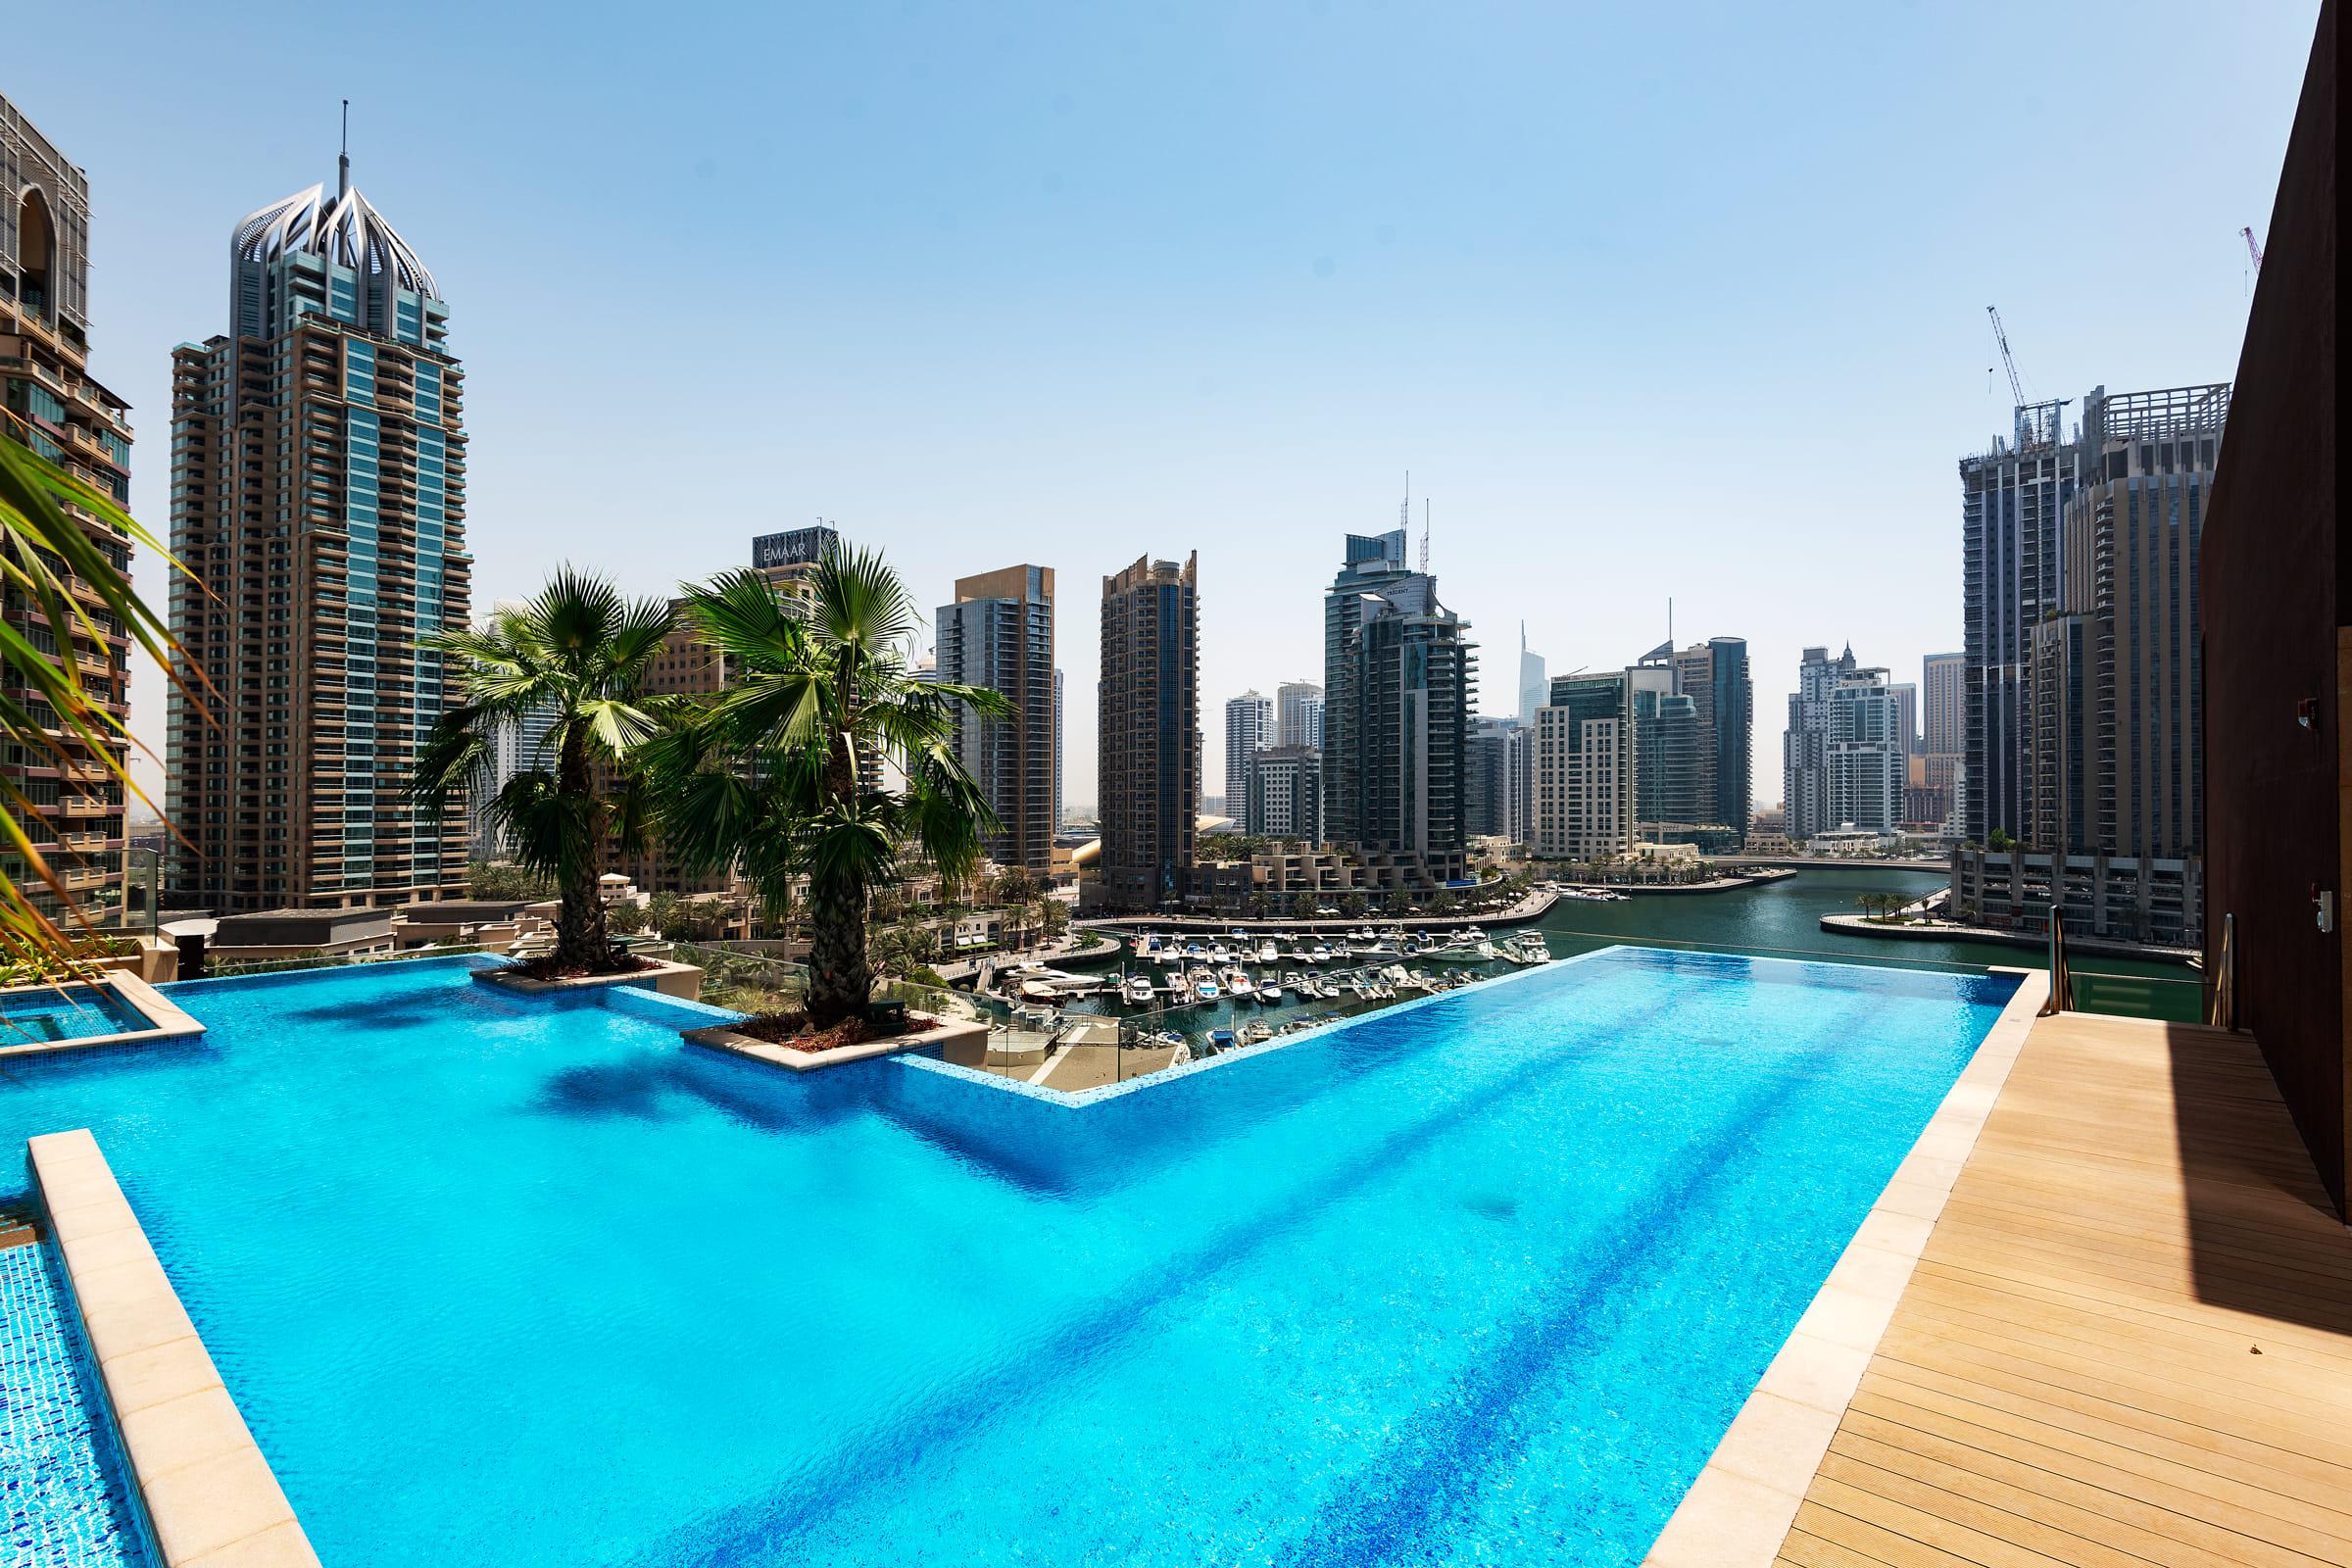 1 Bedroom Apartment | High Floor | Panoramic Views